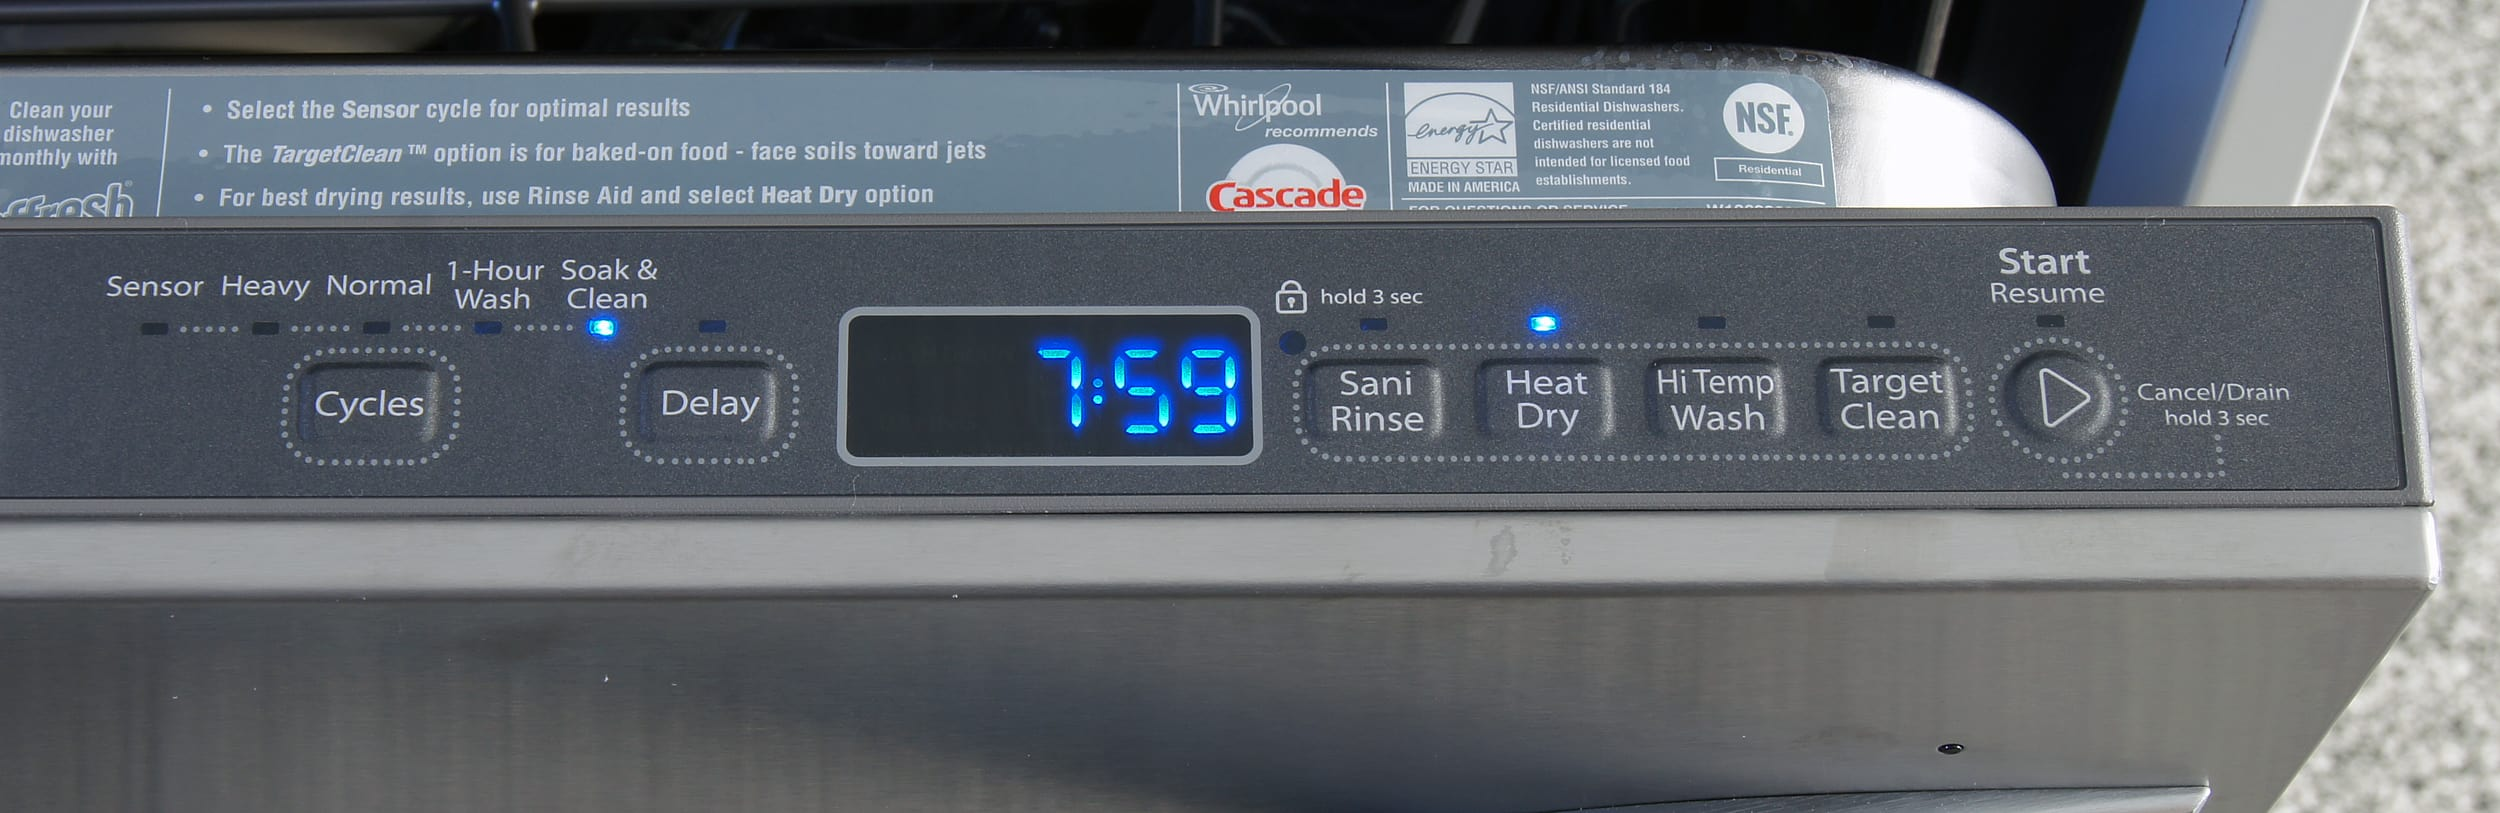 Whirlpool WDT920SADM controls